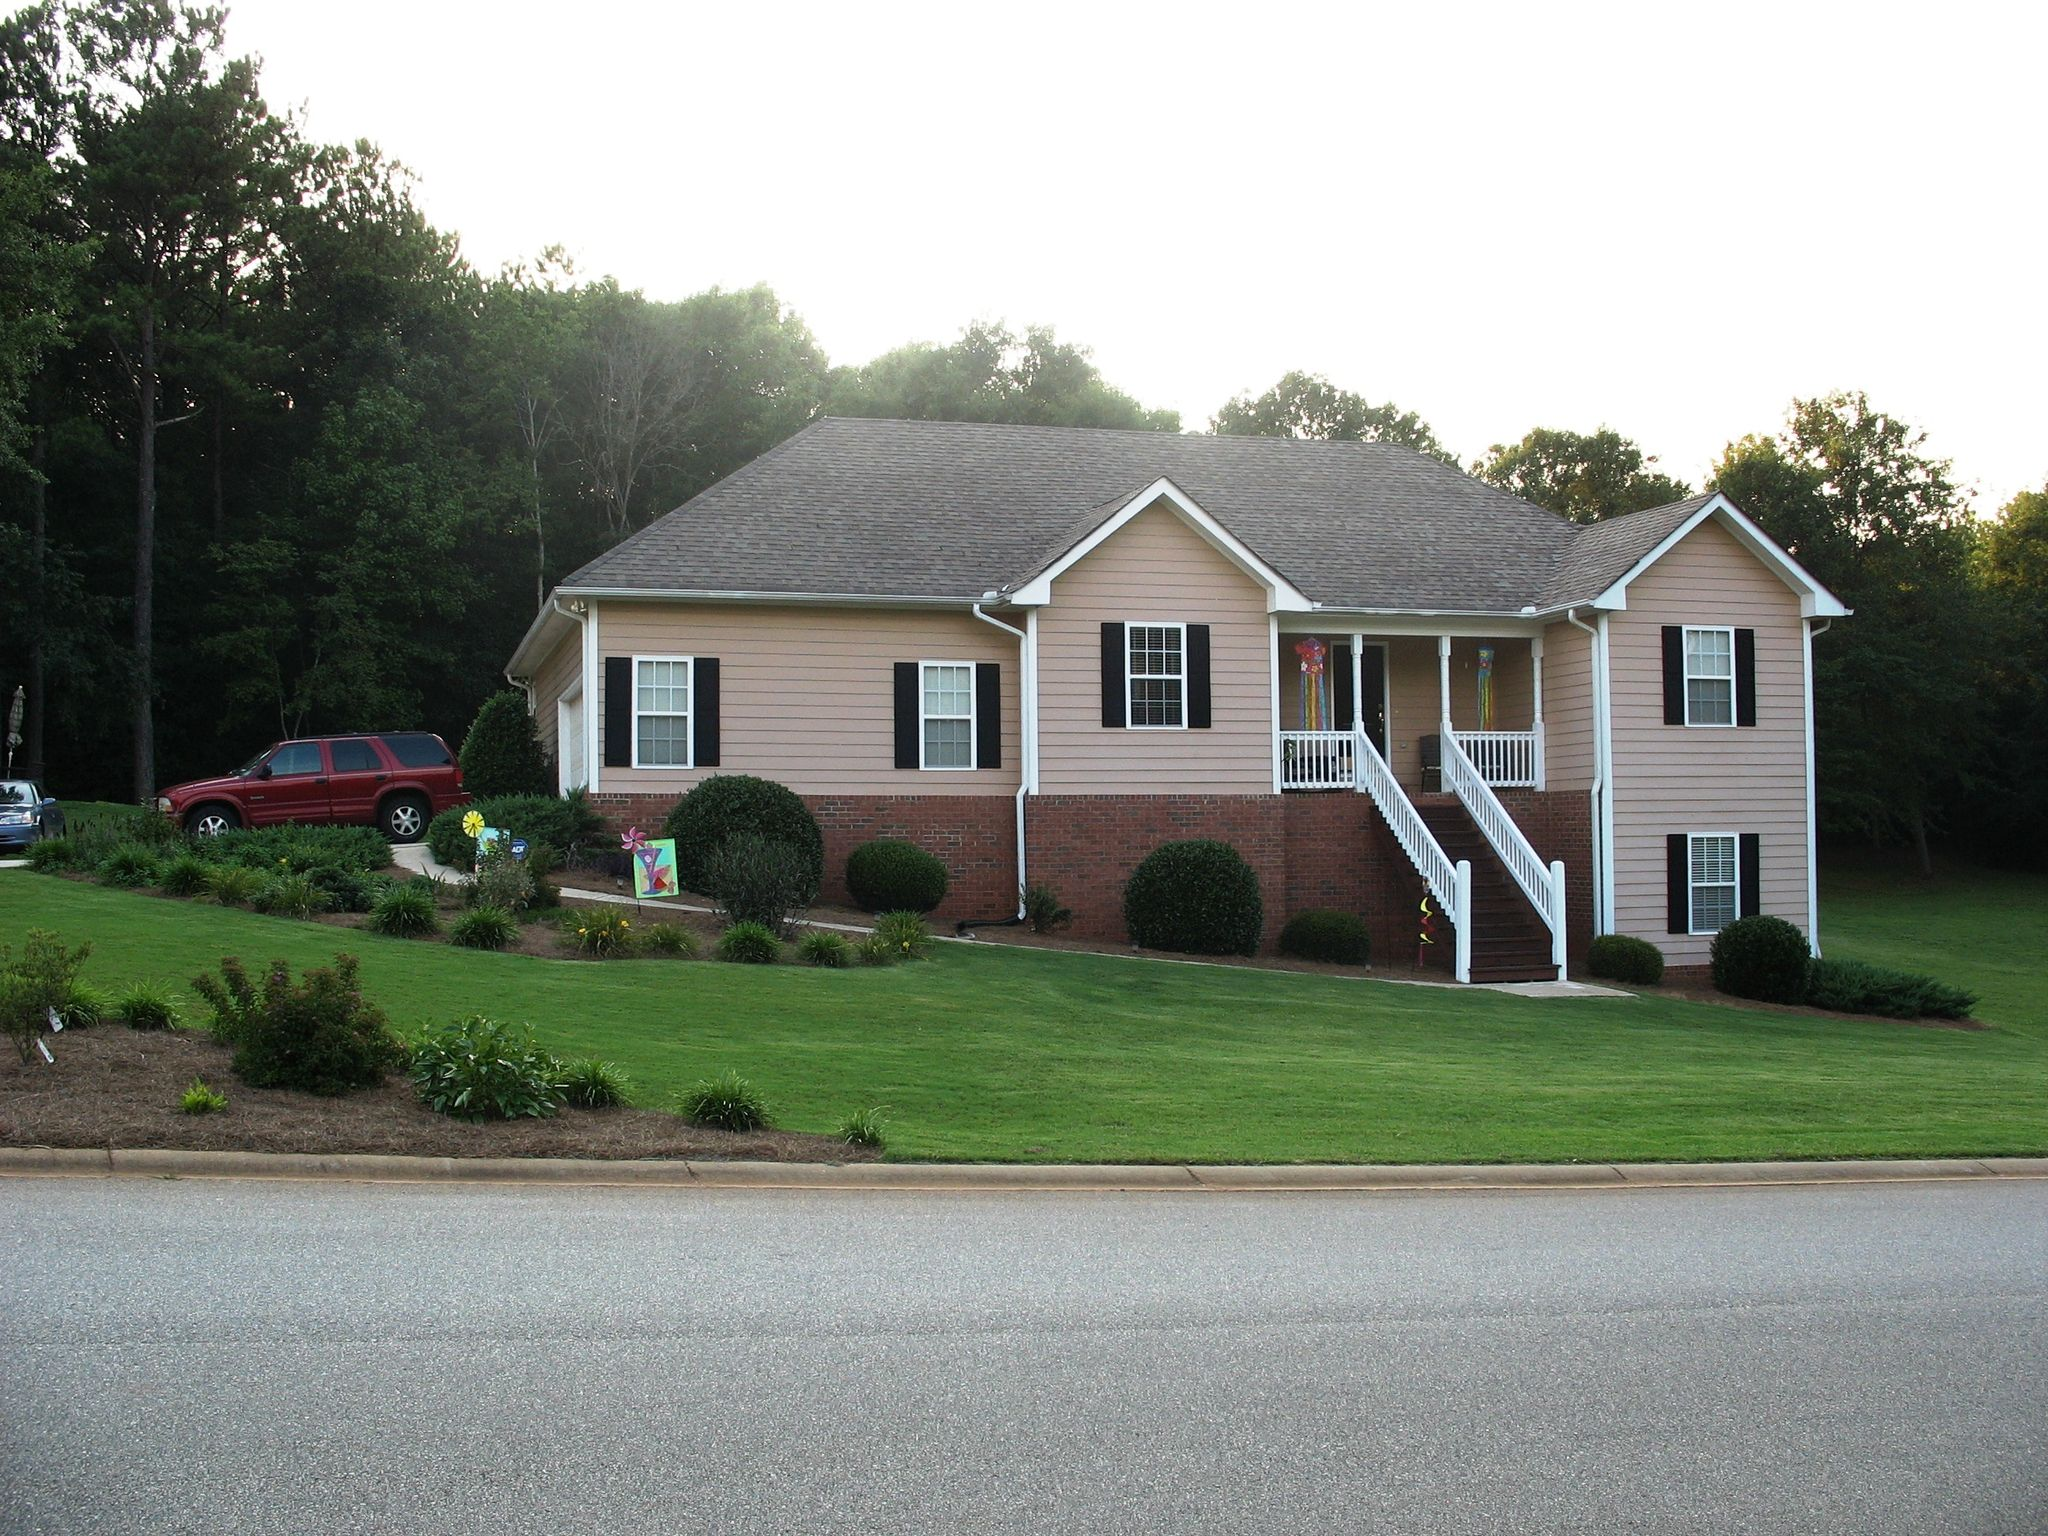 200 Timber Creek Dr Athens GA Estimate and Home Details